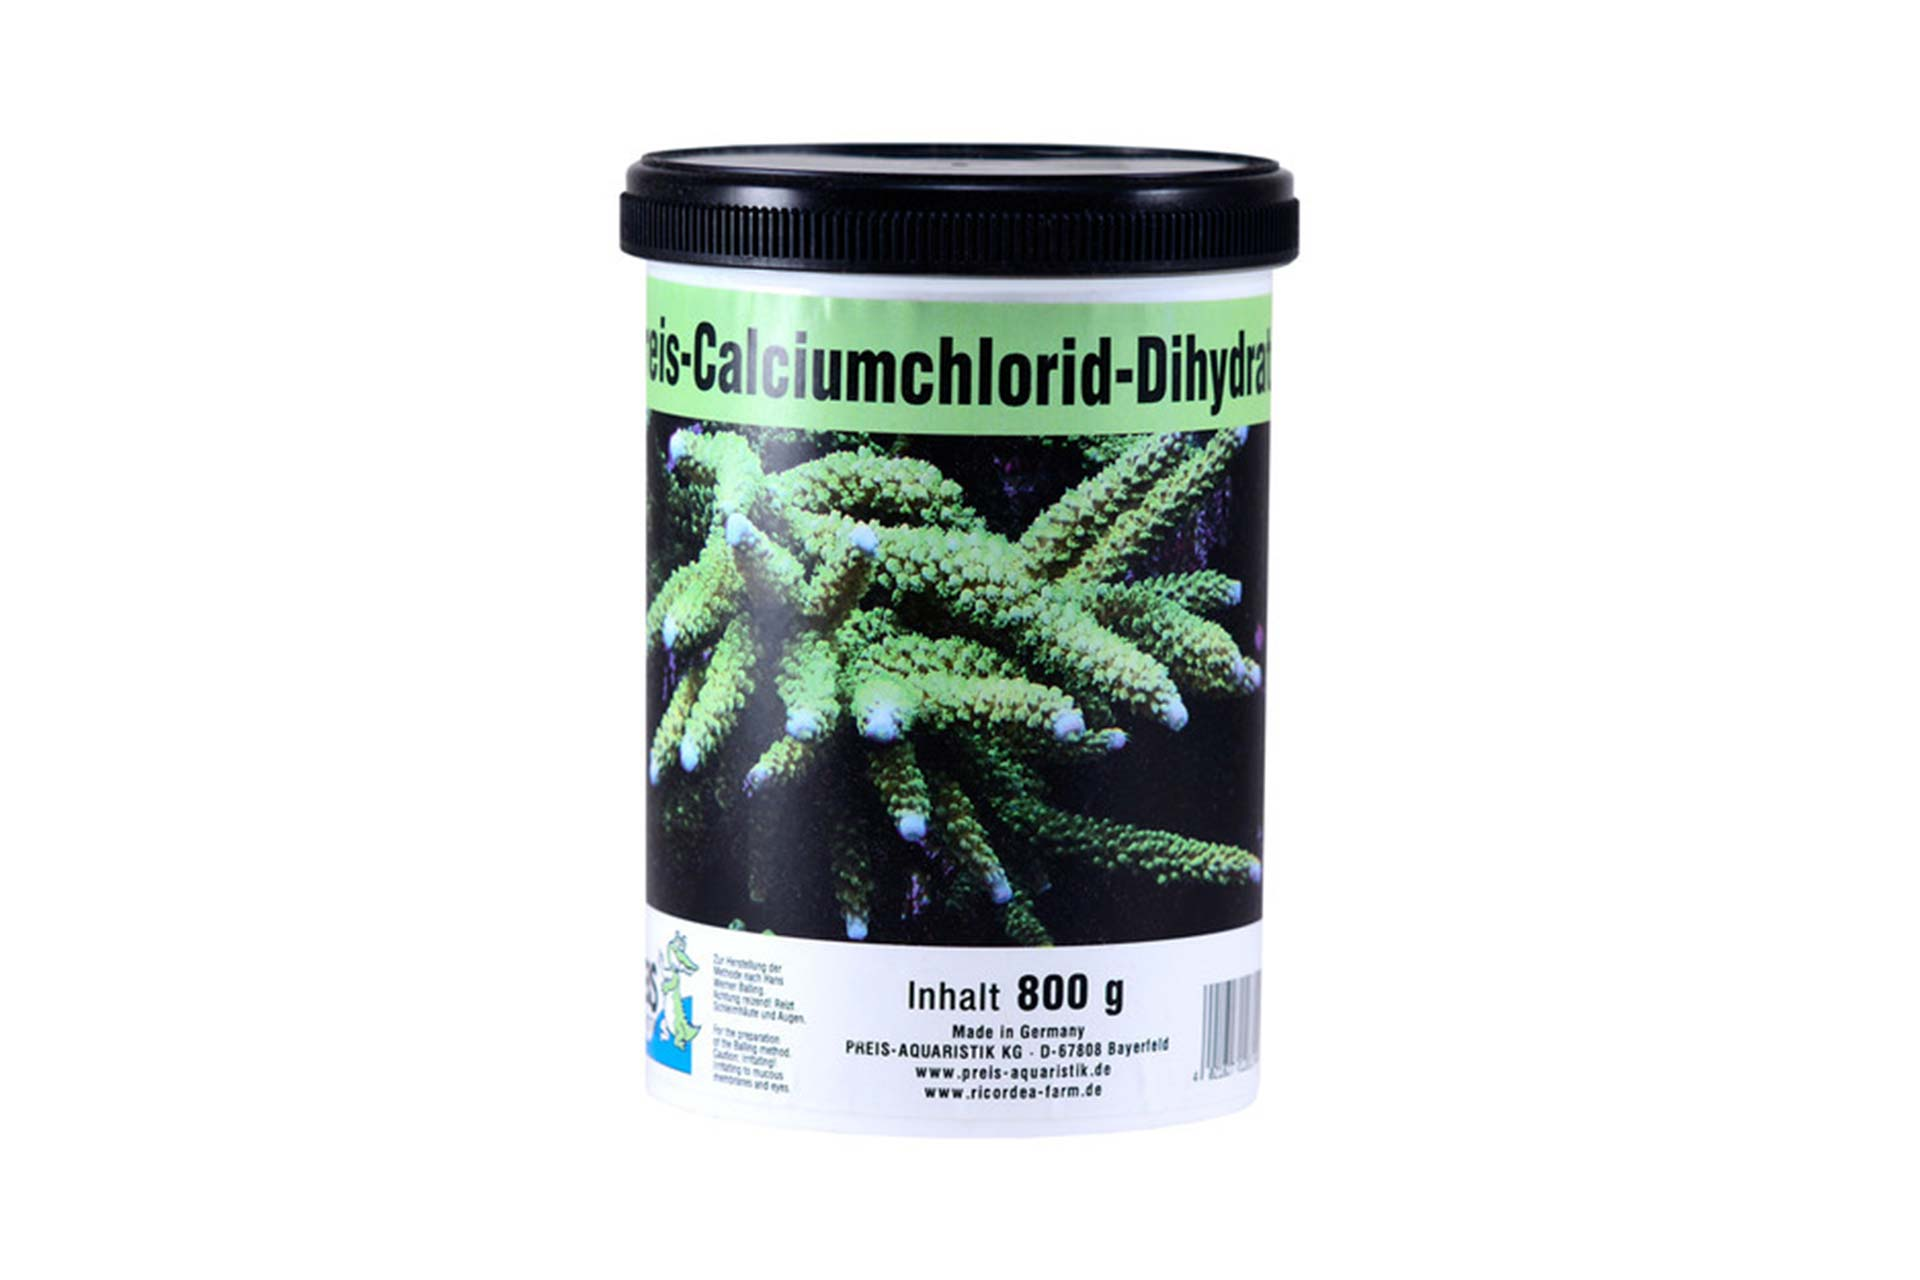 Preis Calciumchlorid-Dihydrat 800g